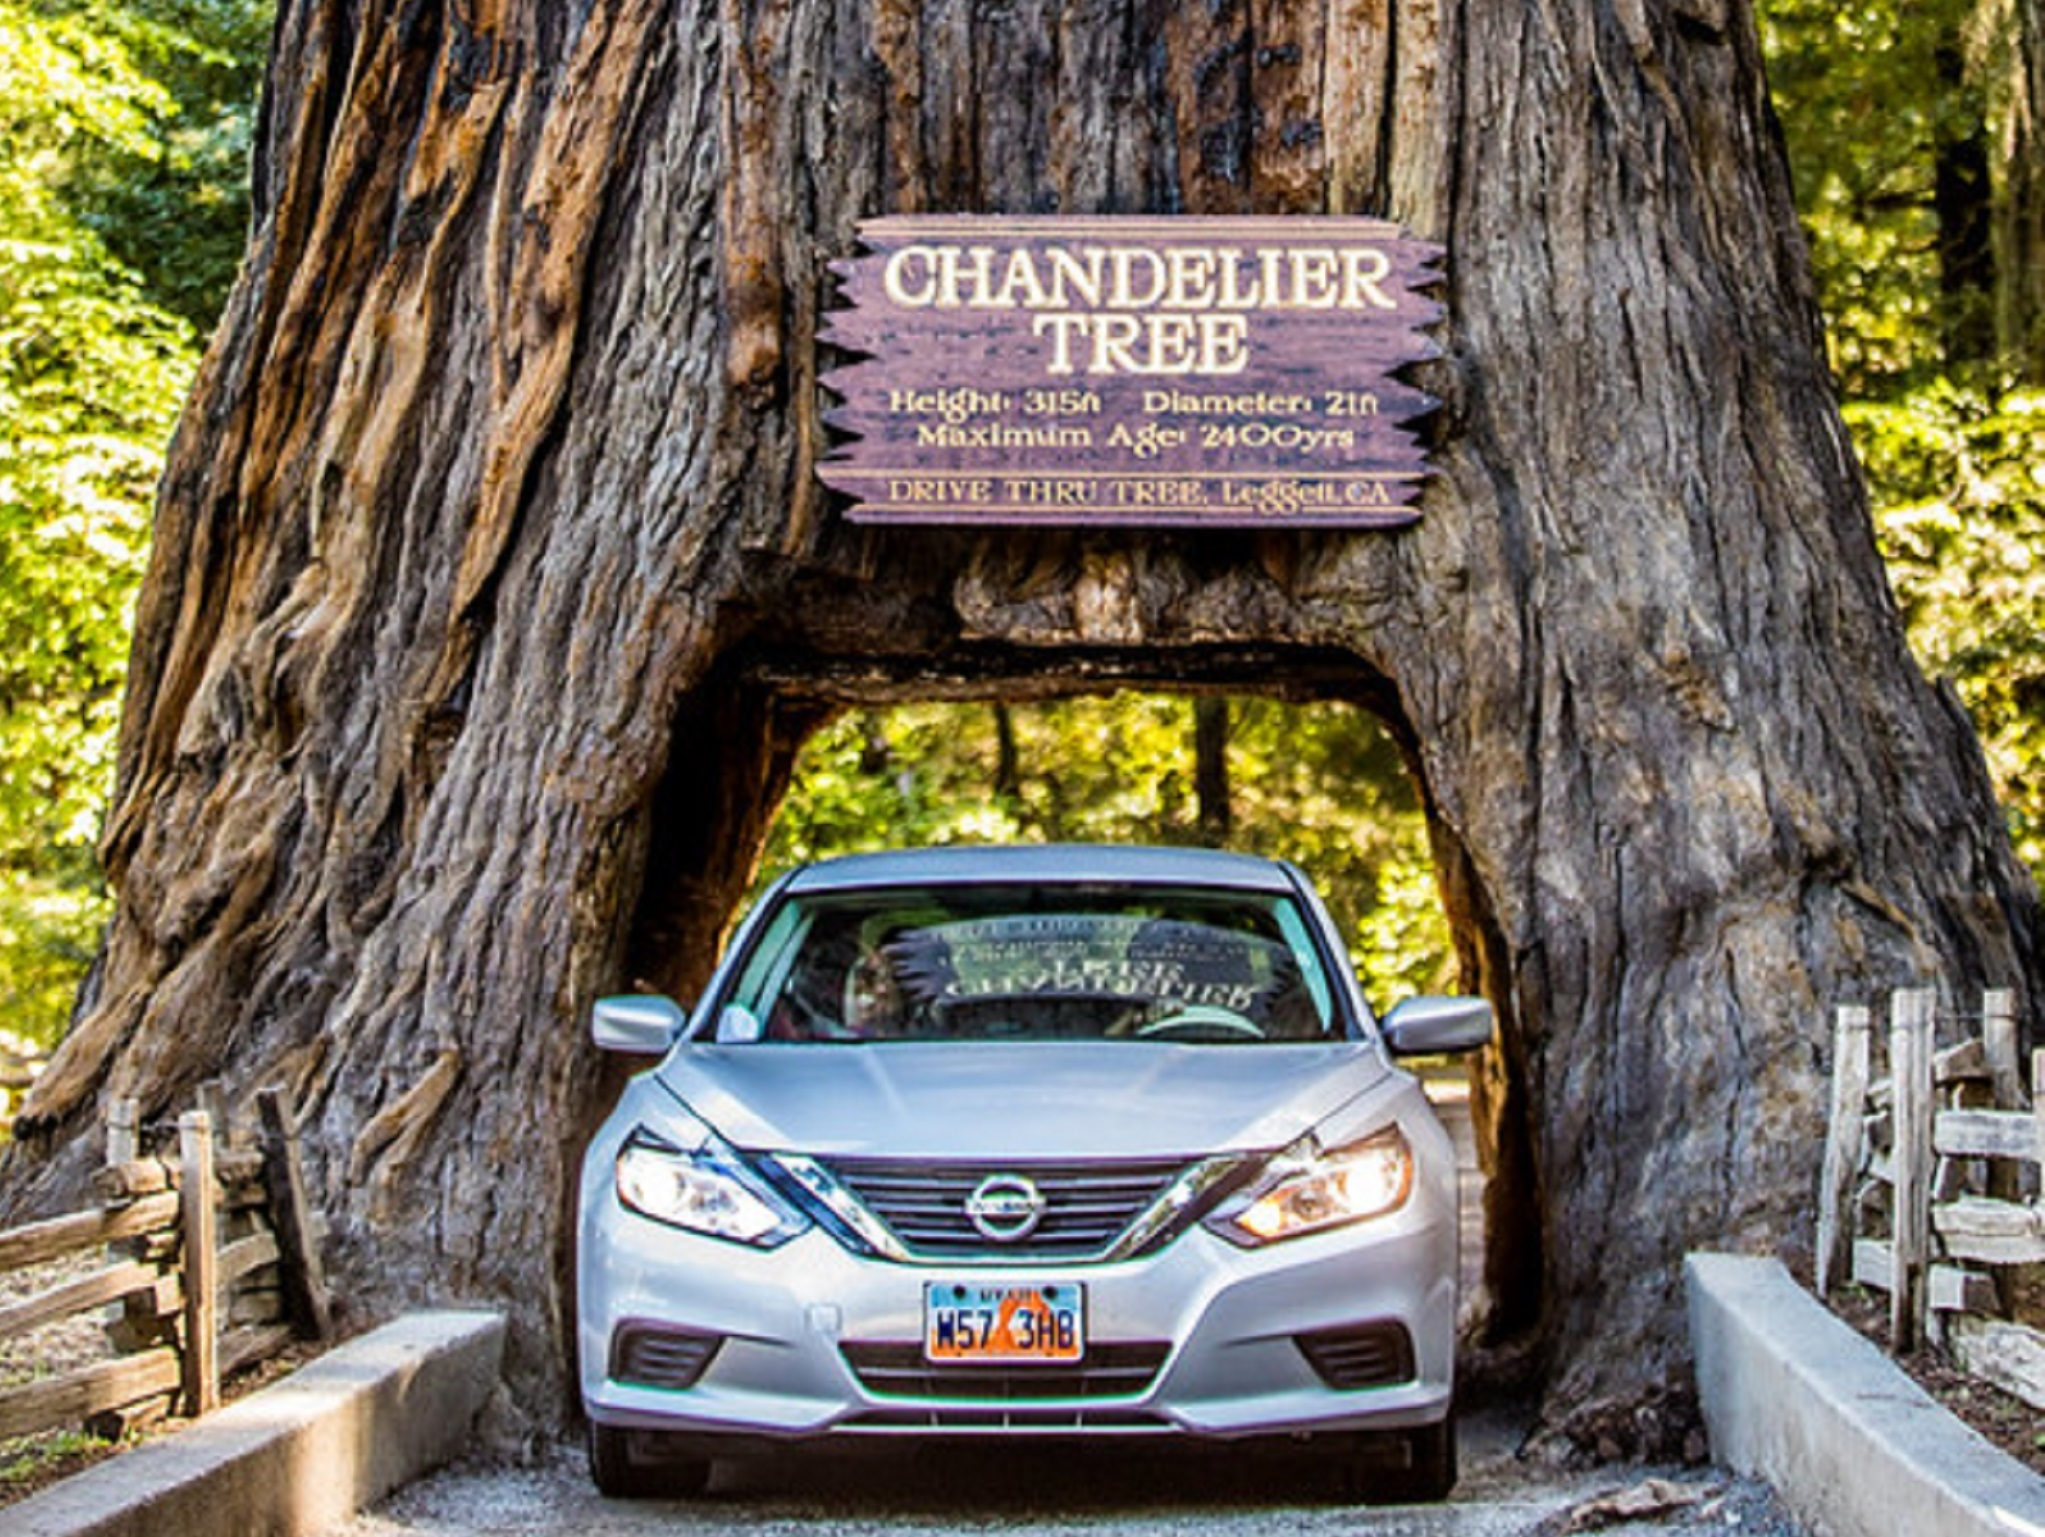 A car driving through a giant redwood trunk